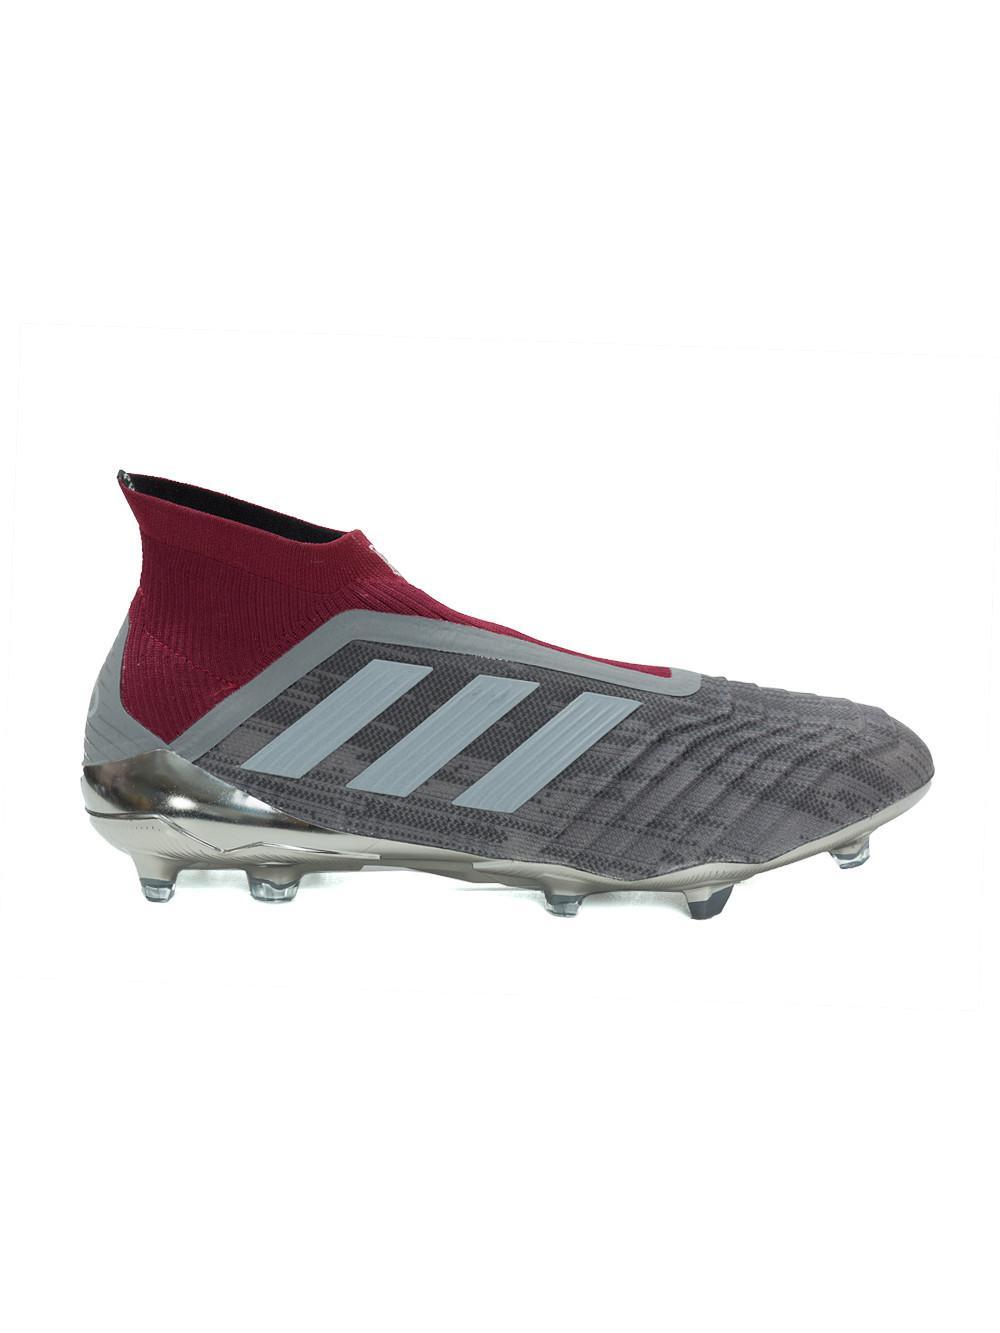 9f5a22ab378 adidas x paul pogba predator 18+ fg soccer boots for men - lyst